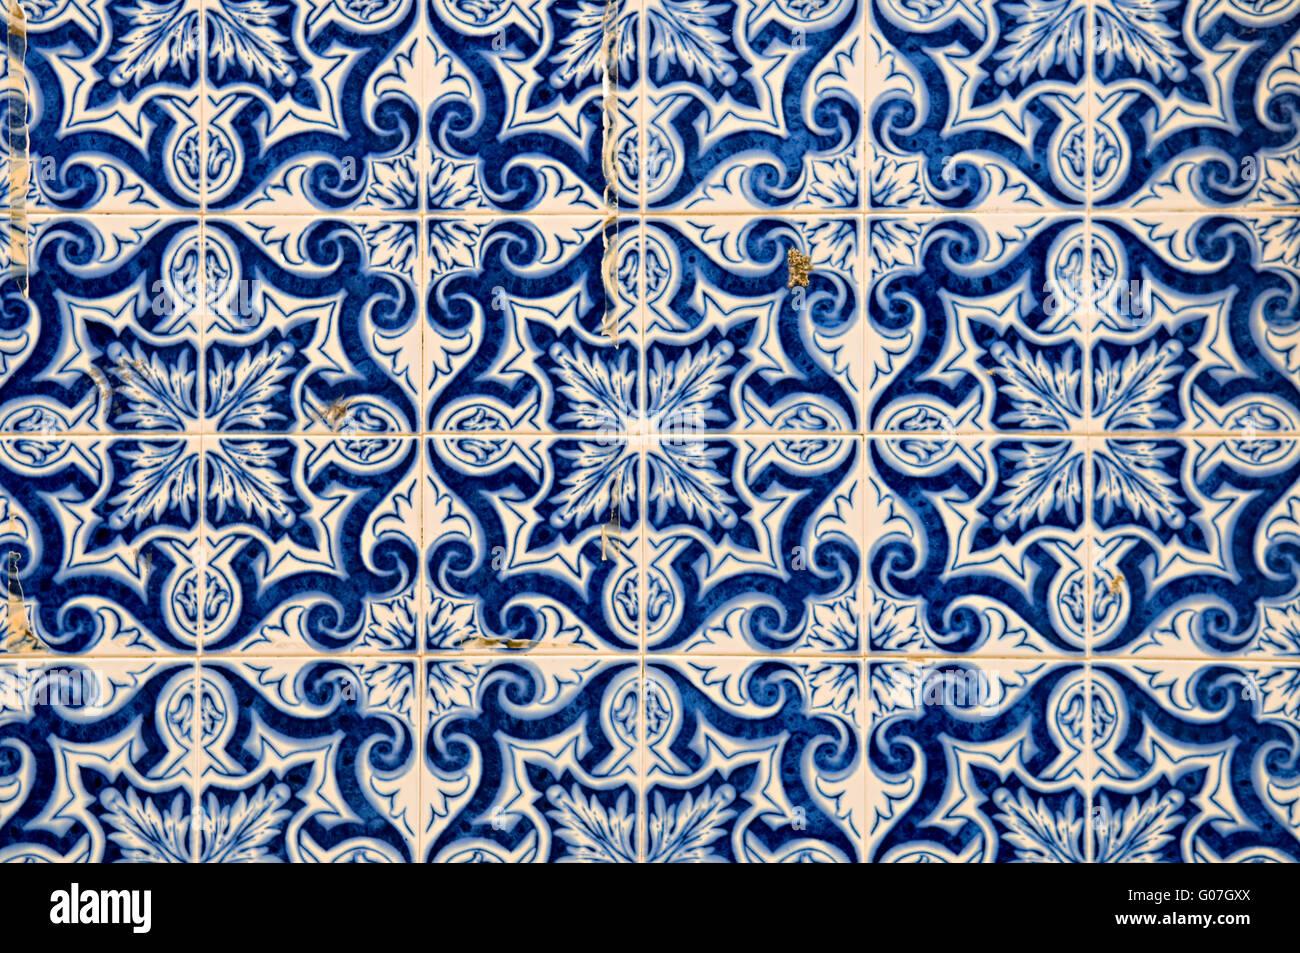 Interesting Tiles Stock Photos & Interesting Tiles Stock Images - Alamy